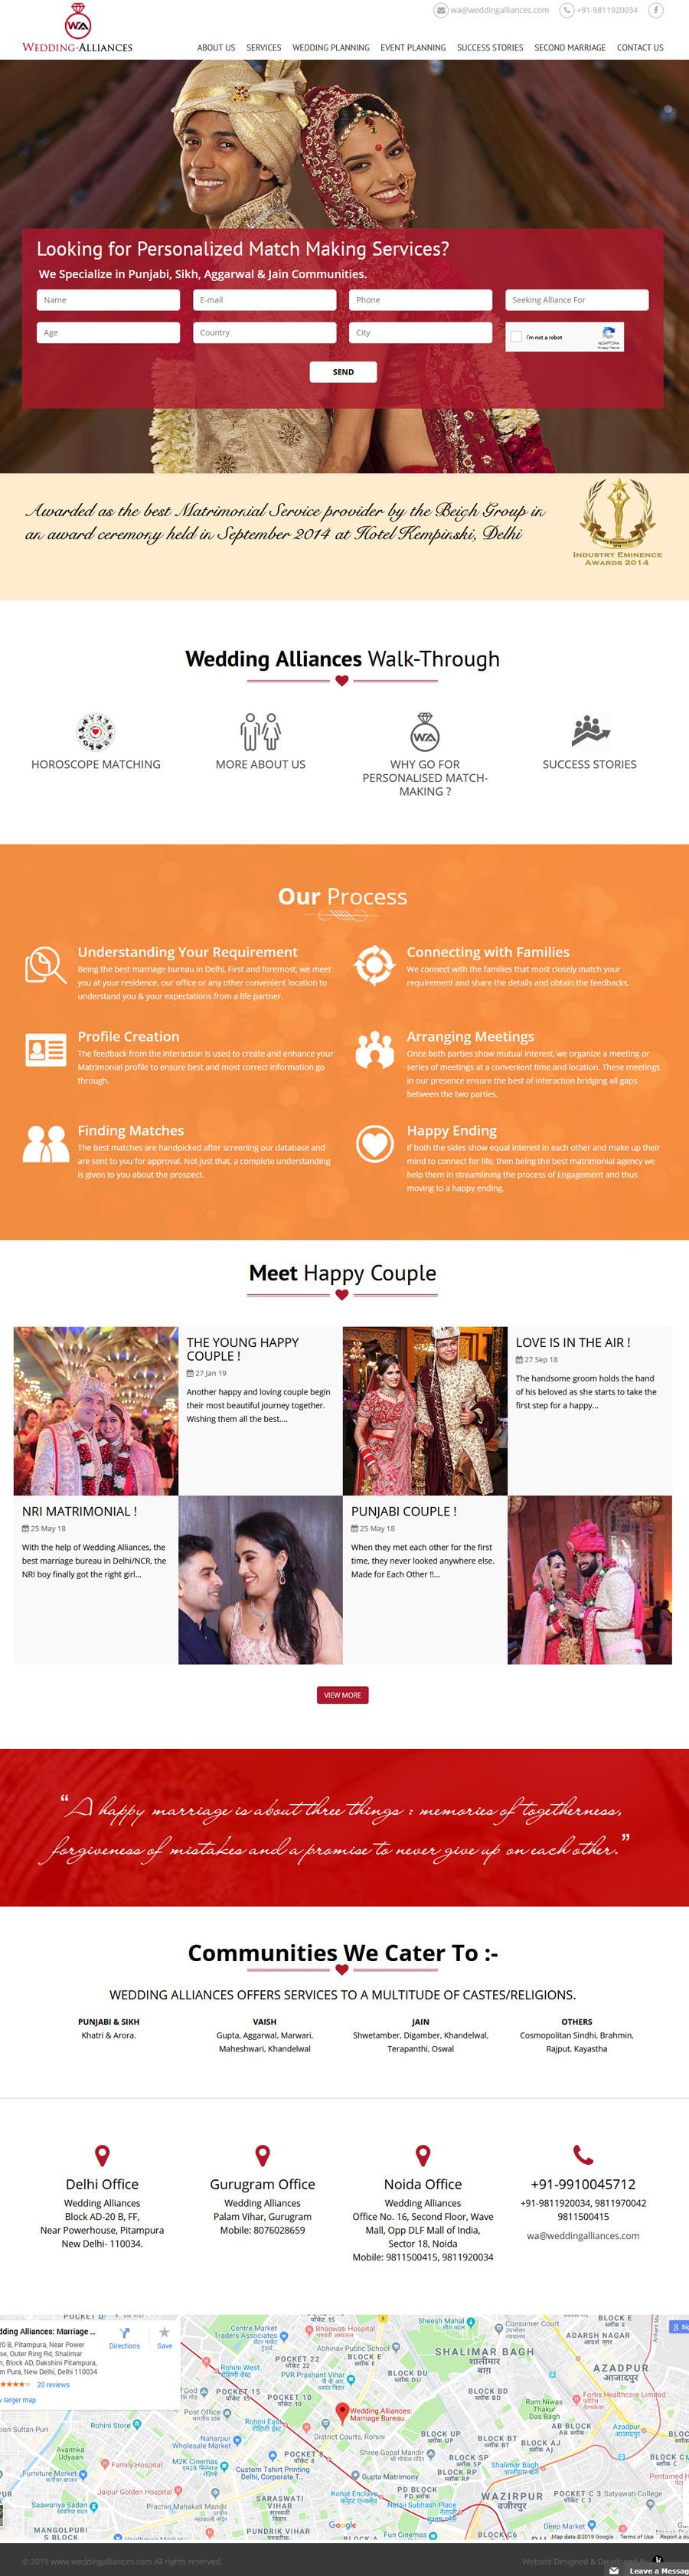 Wedding Alliances